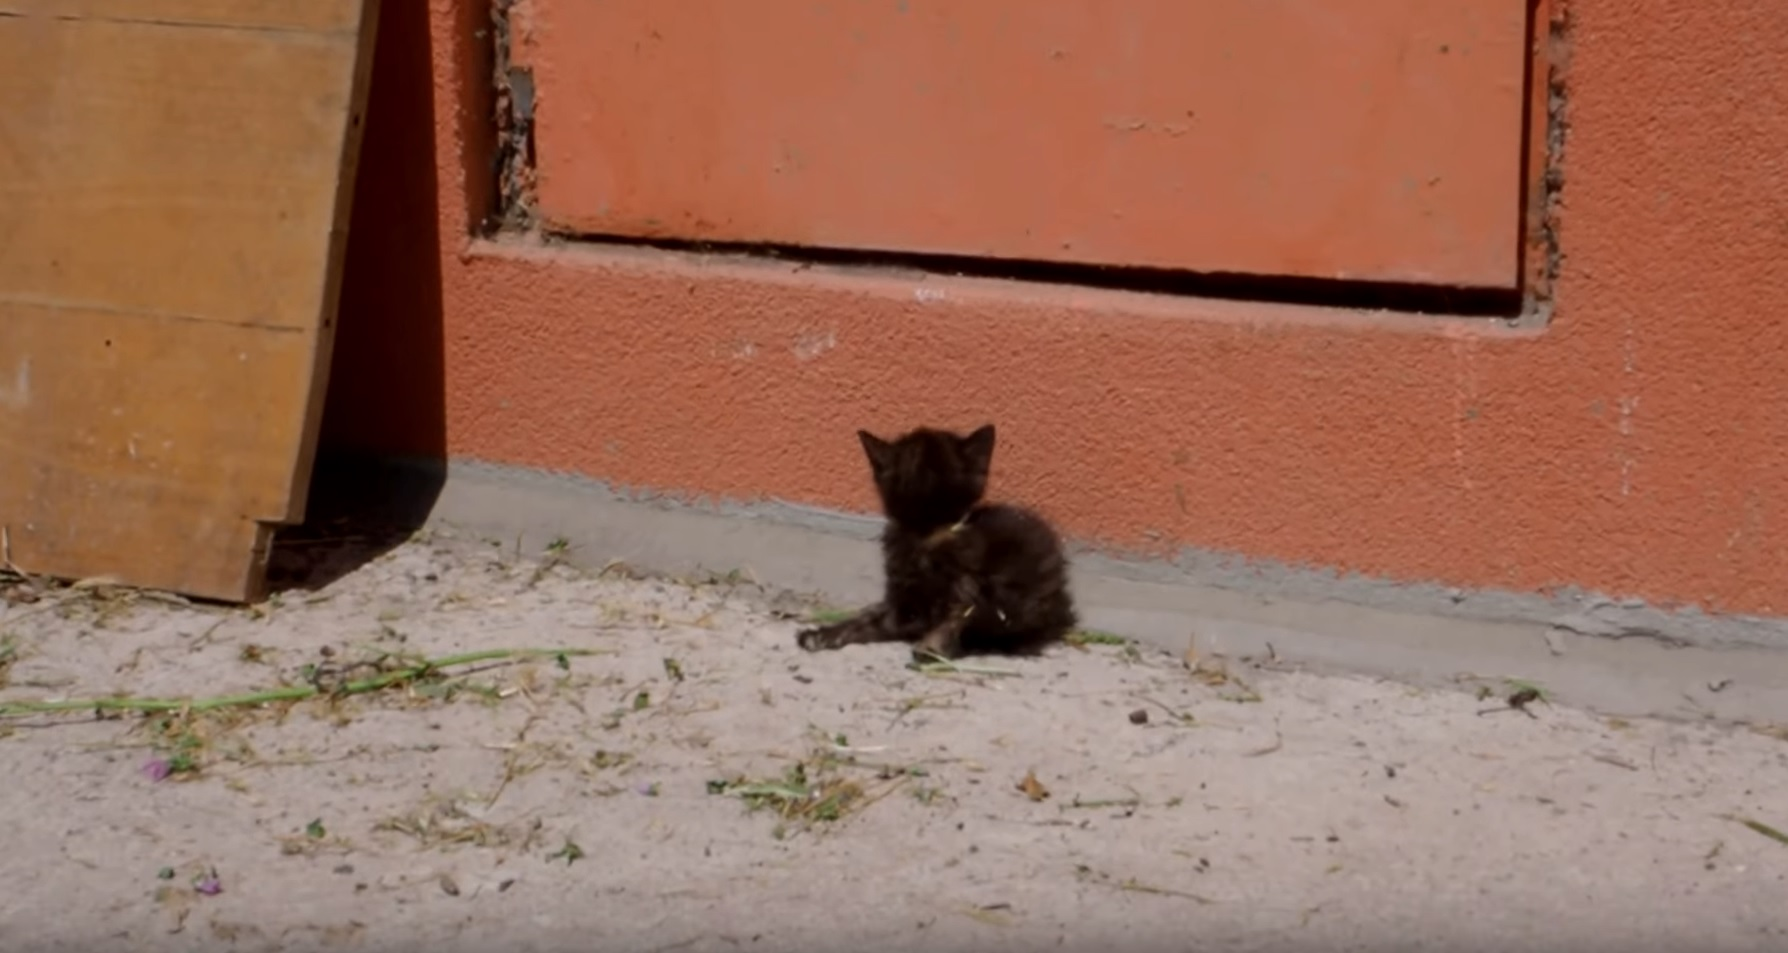 Blind Kitten Found On Street